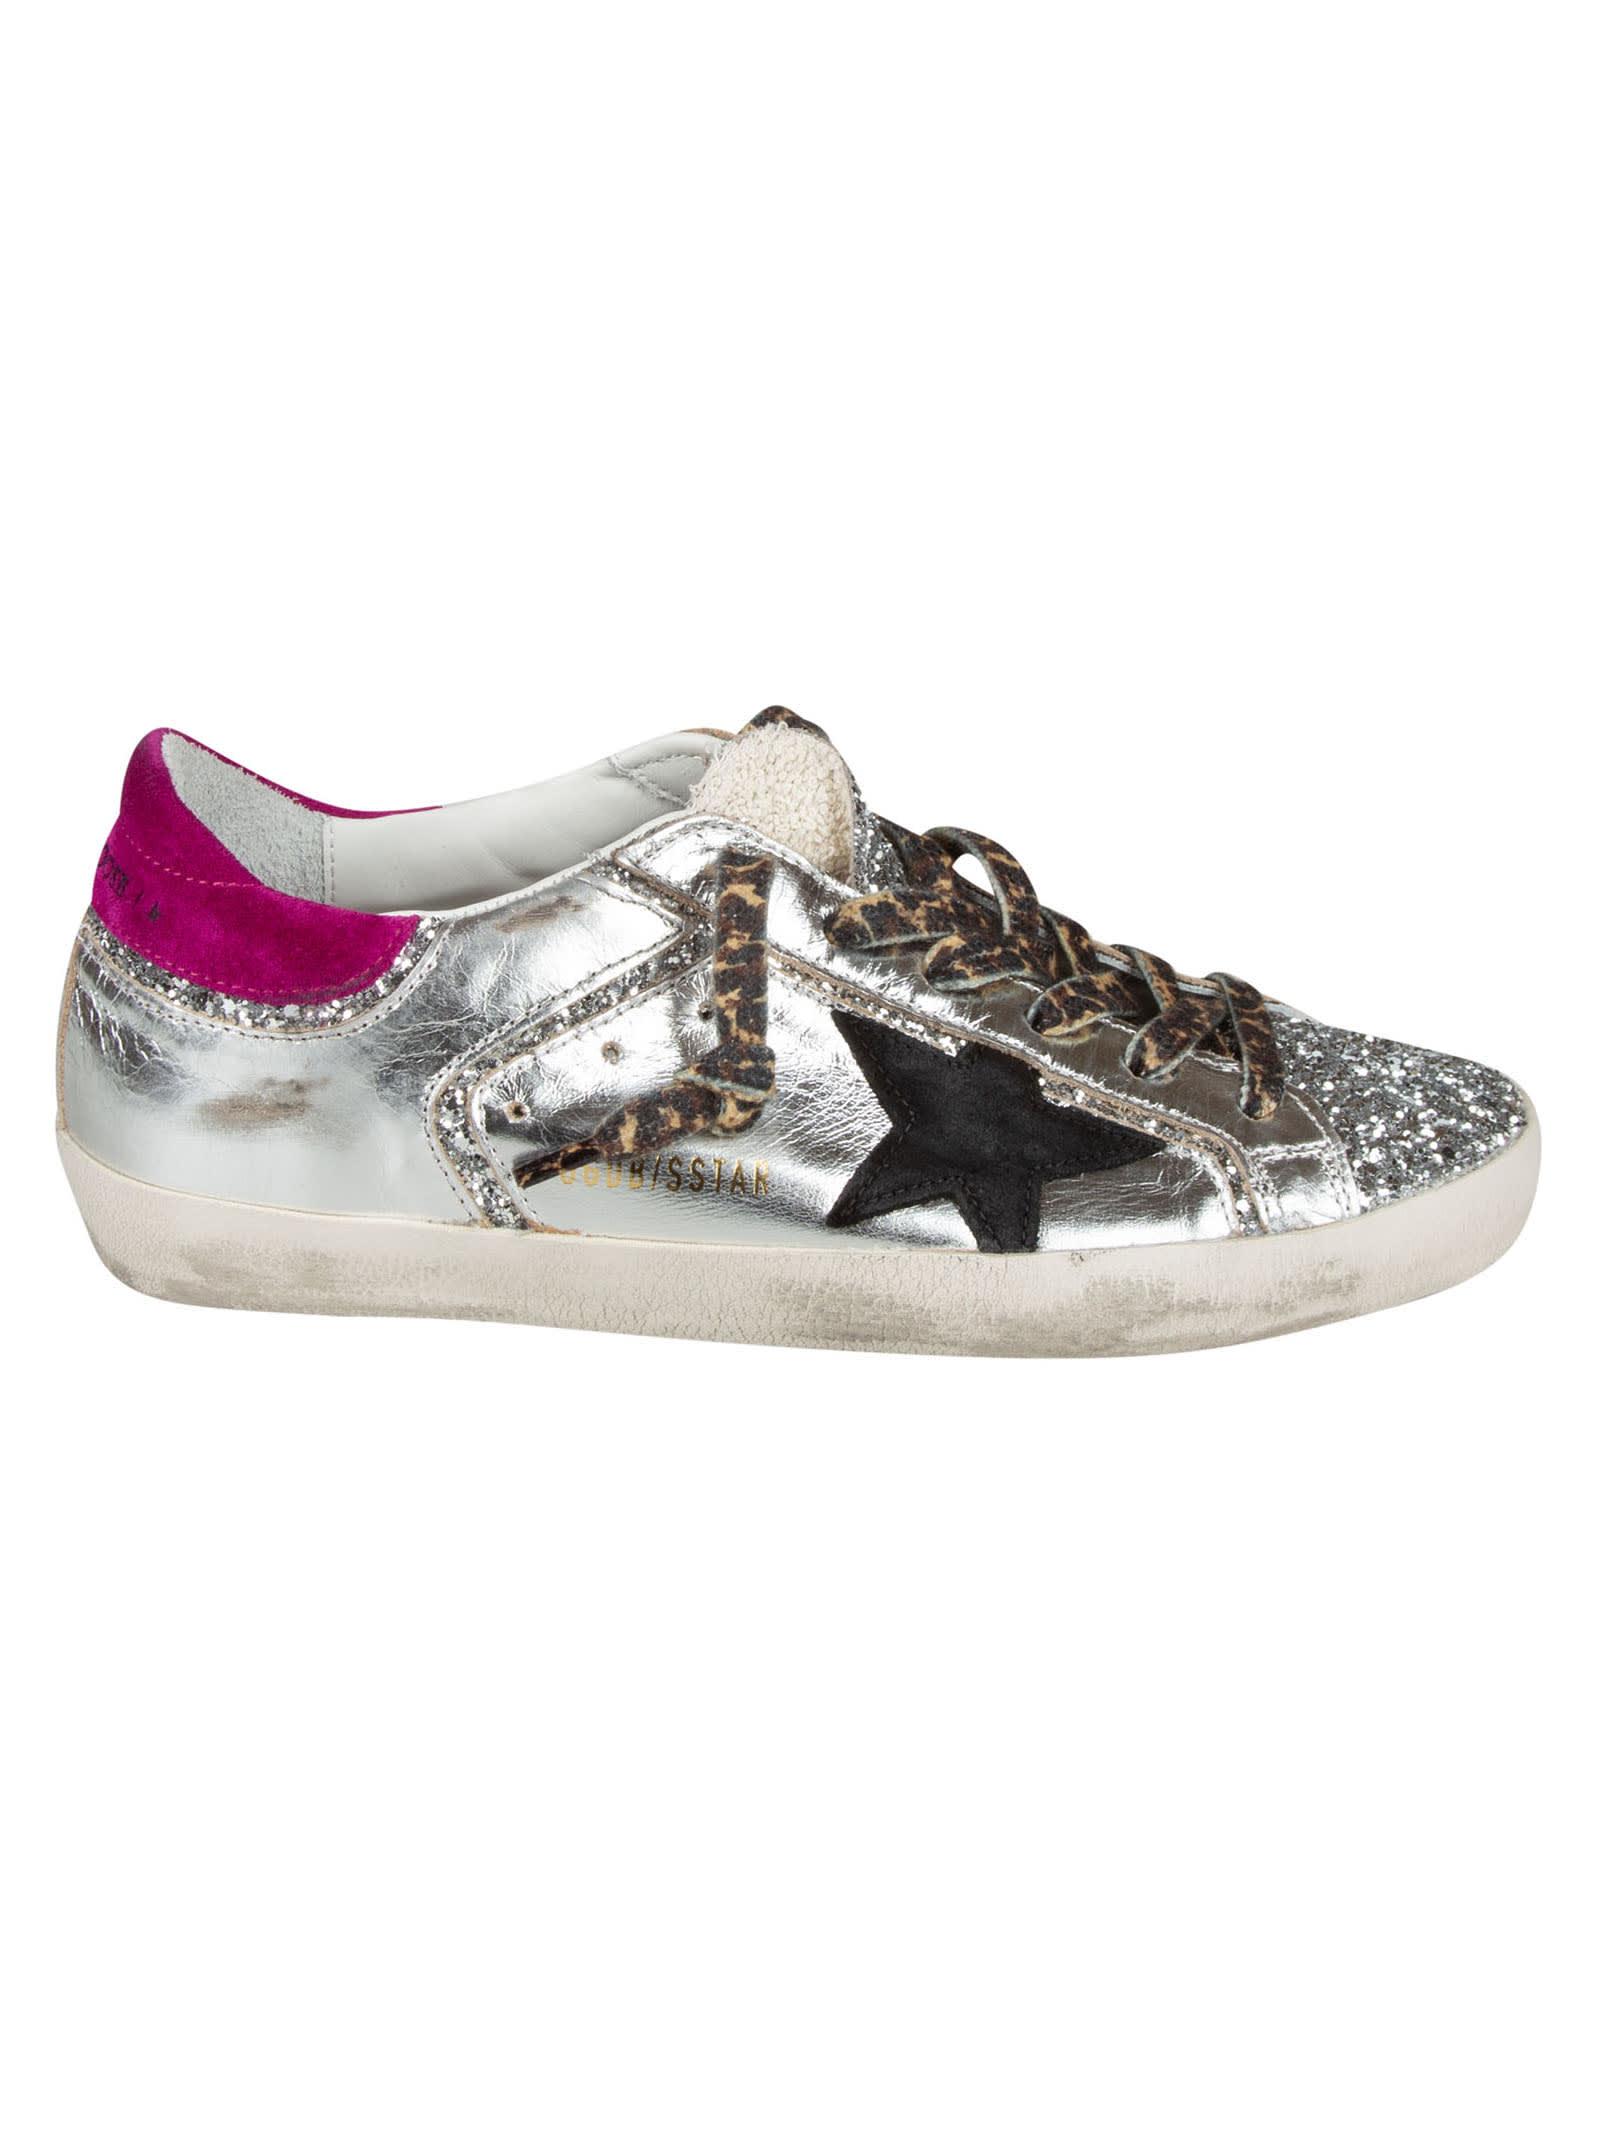 Golden Goose Super-star Double-quarter Sneakers